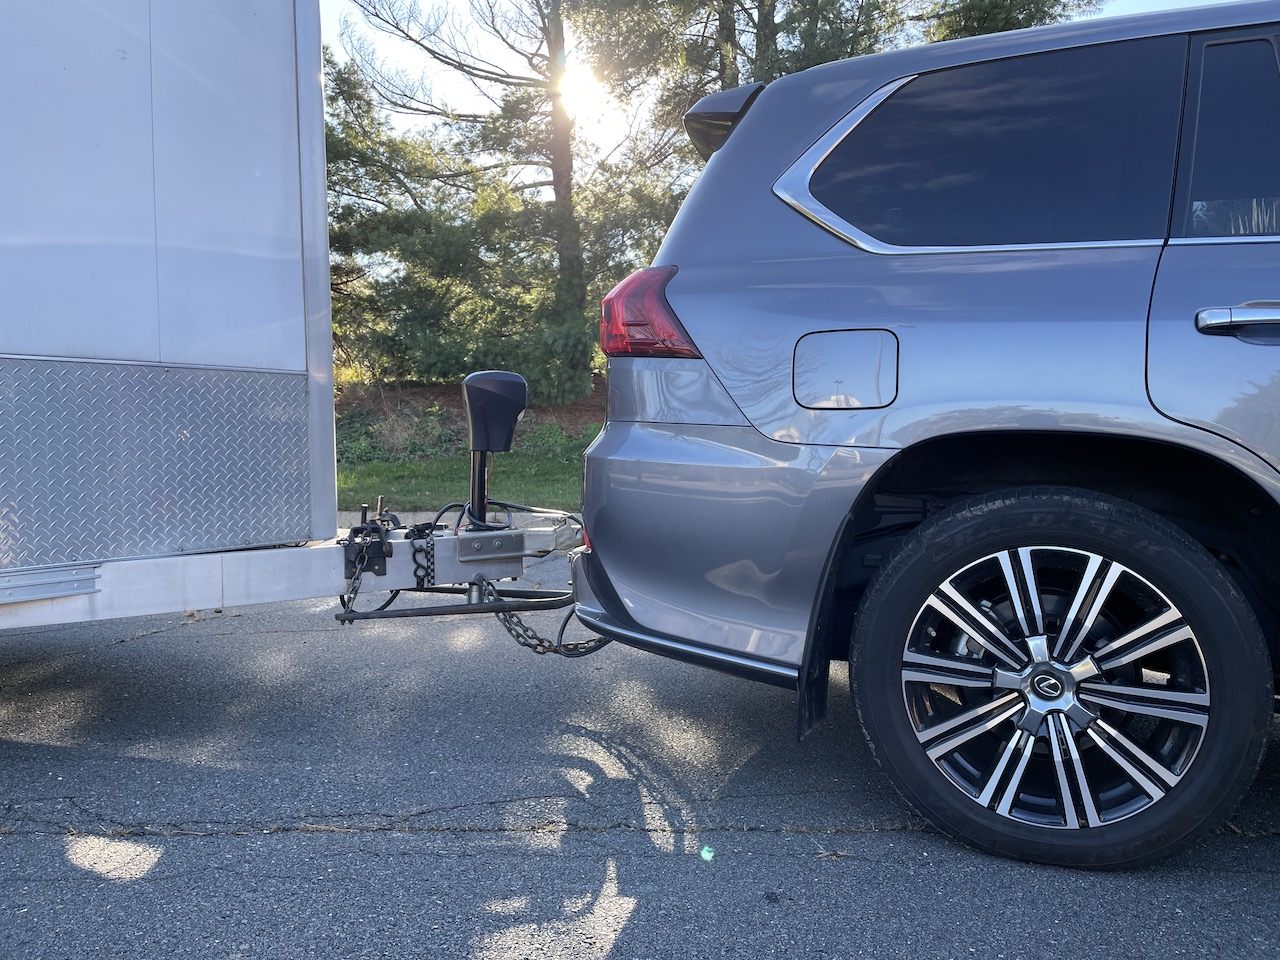 2020 Lexus LX 570 towing hitch